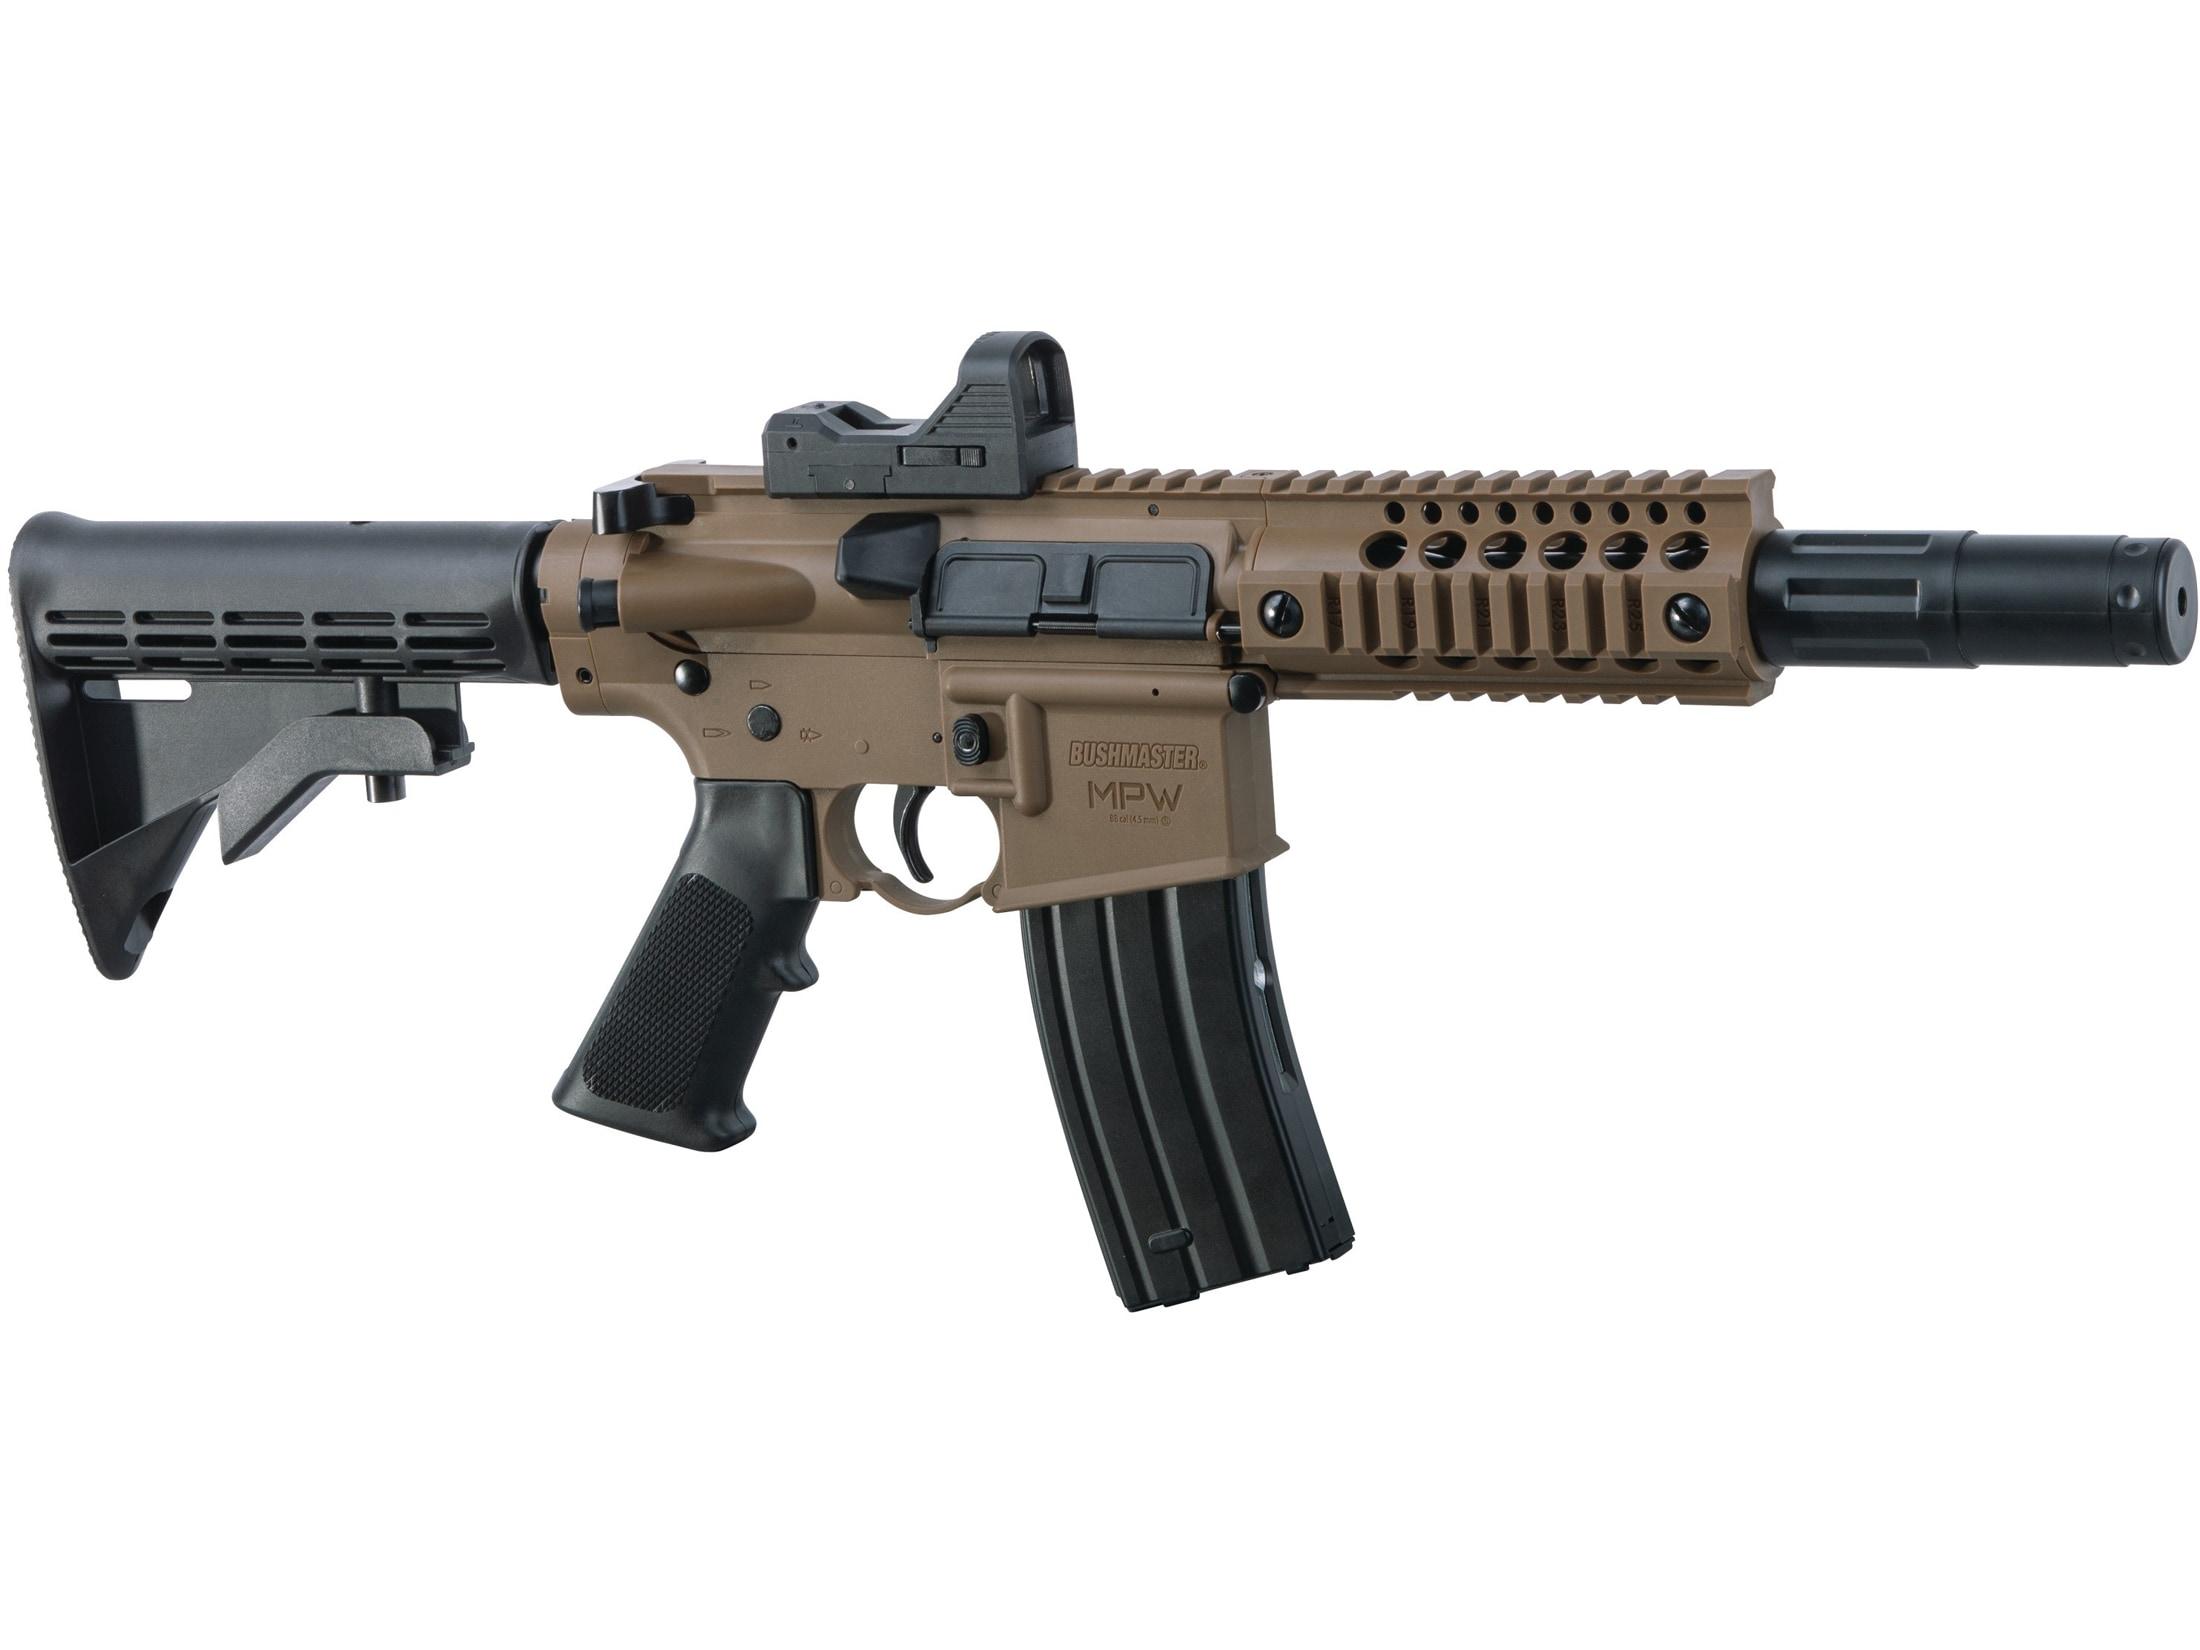 Bushmaster MPW Full Auto CO2 177 Cal BB Air Rifle Red Dot